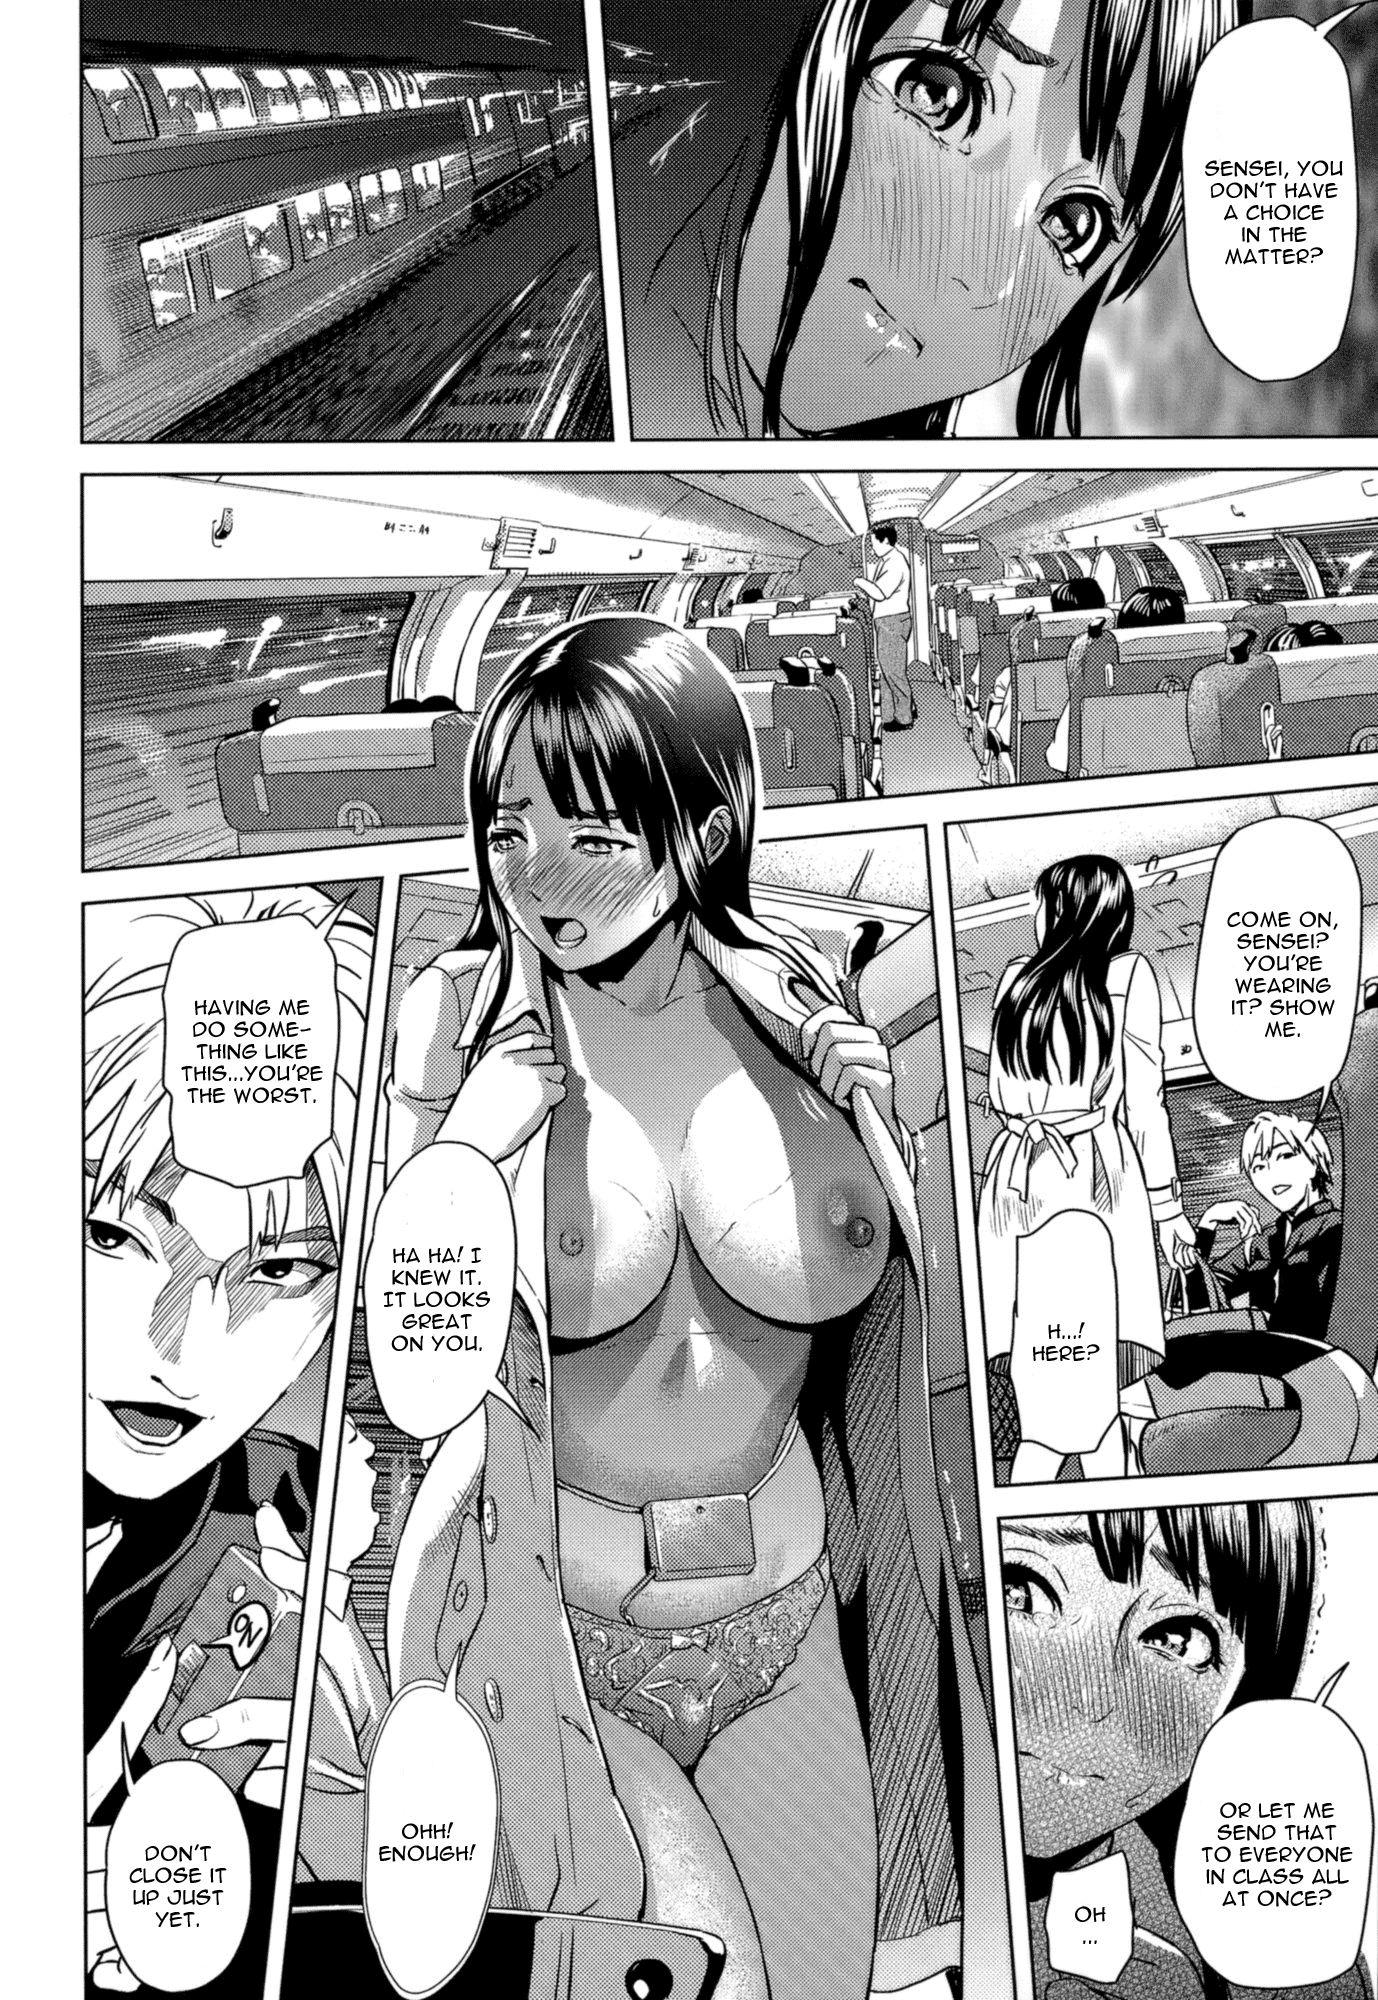 Hyji / Haiji / Hy-dou — Сборник хентай манги [Ptcen] [JAP,ENG,RUS] Manga Hentai